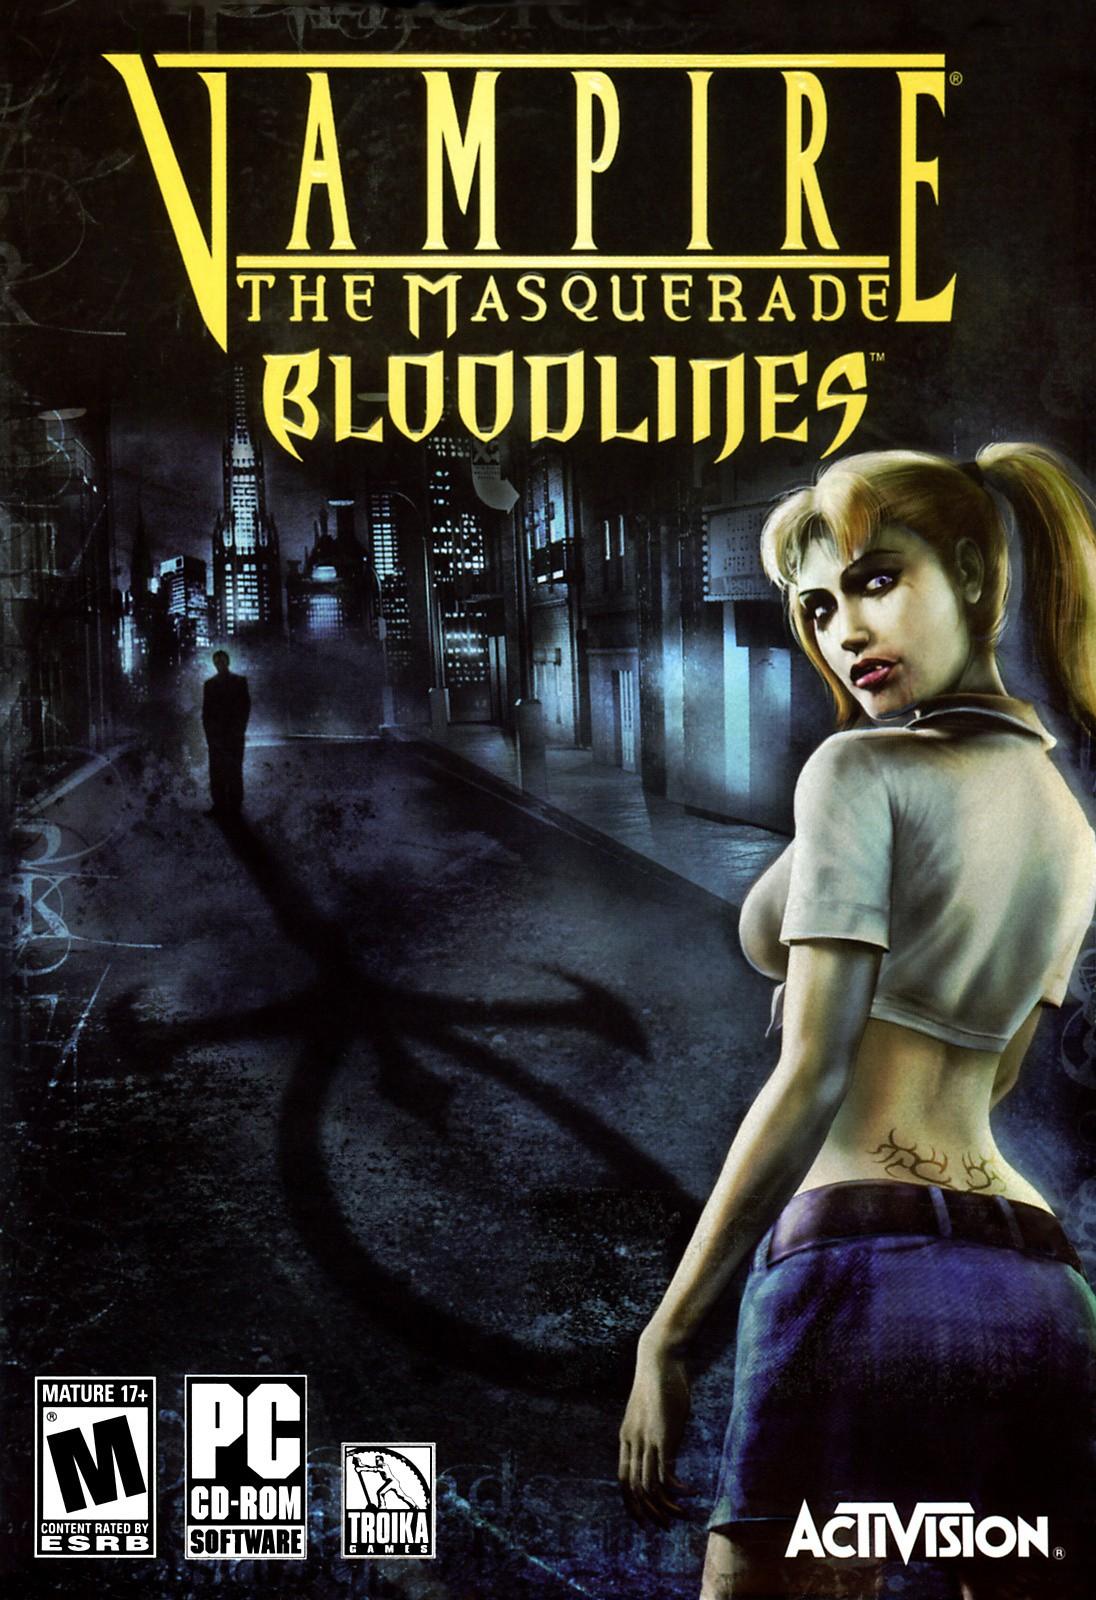 Vampire-The-Masquerade-Bloodlines-Box-Art